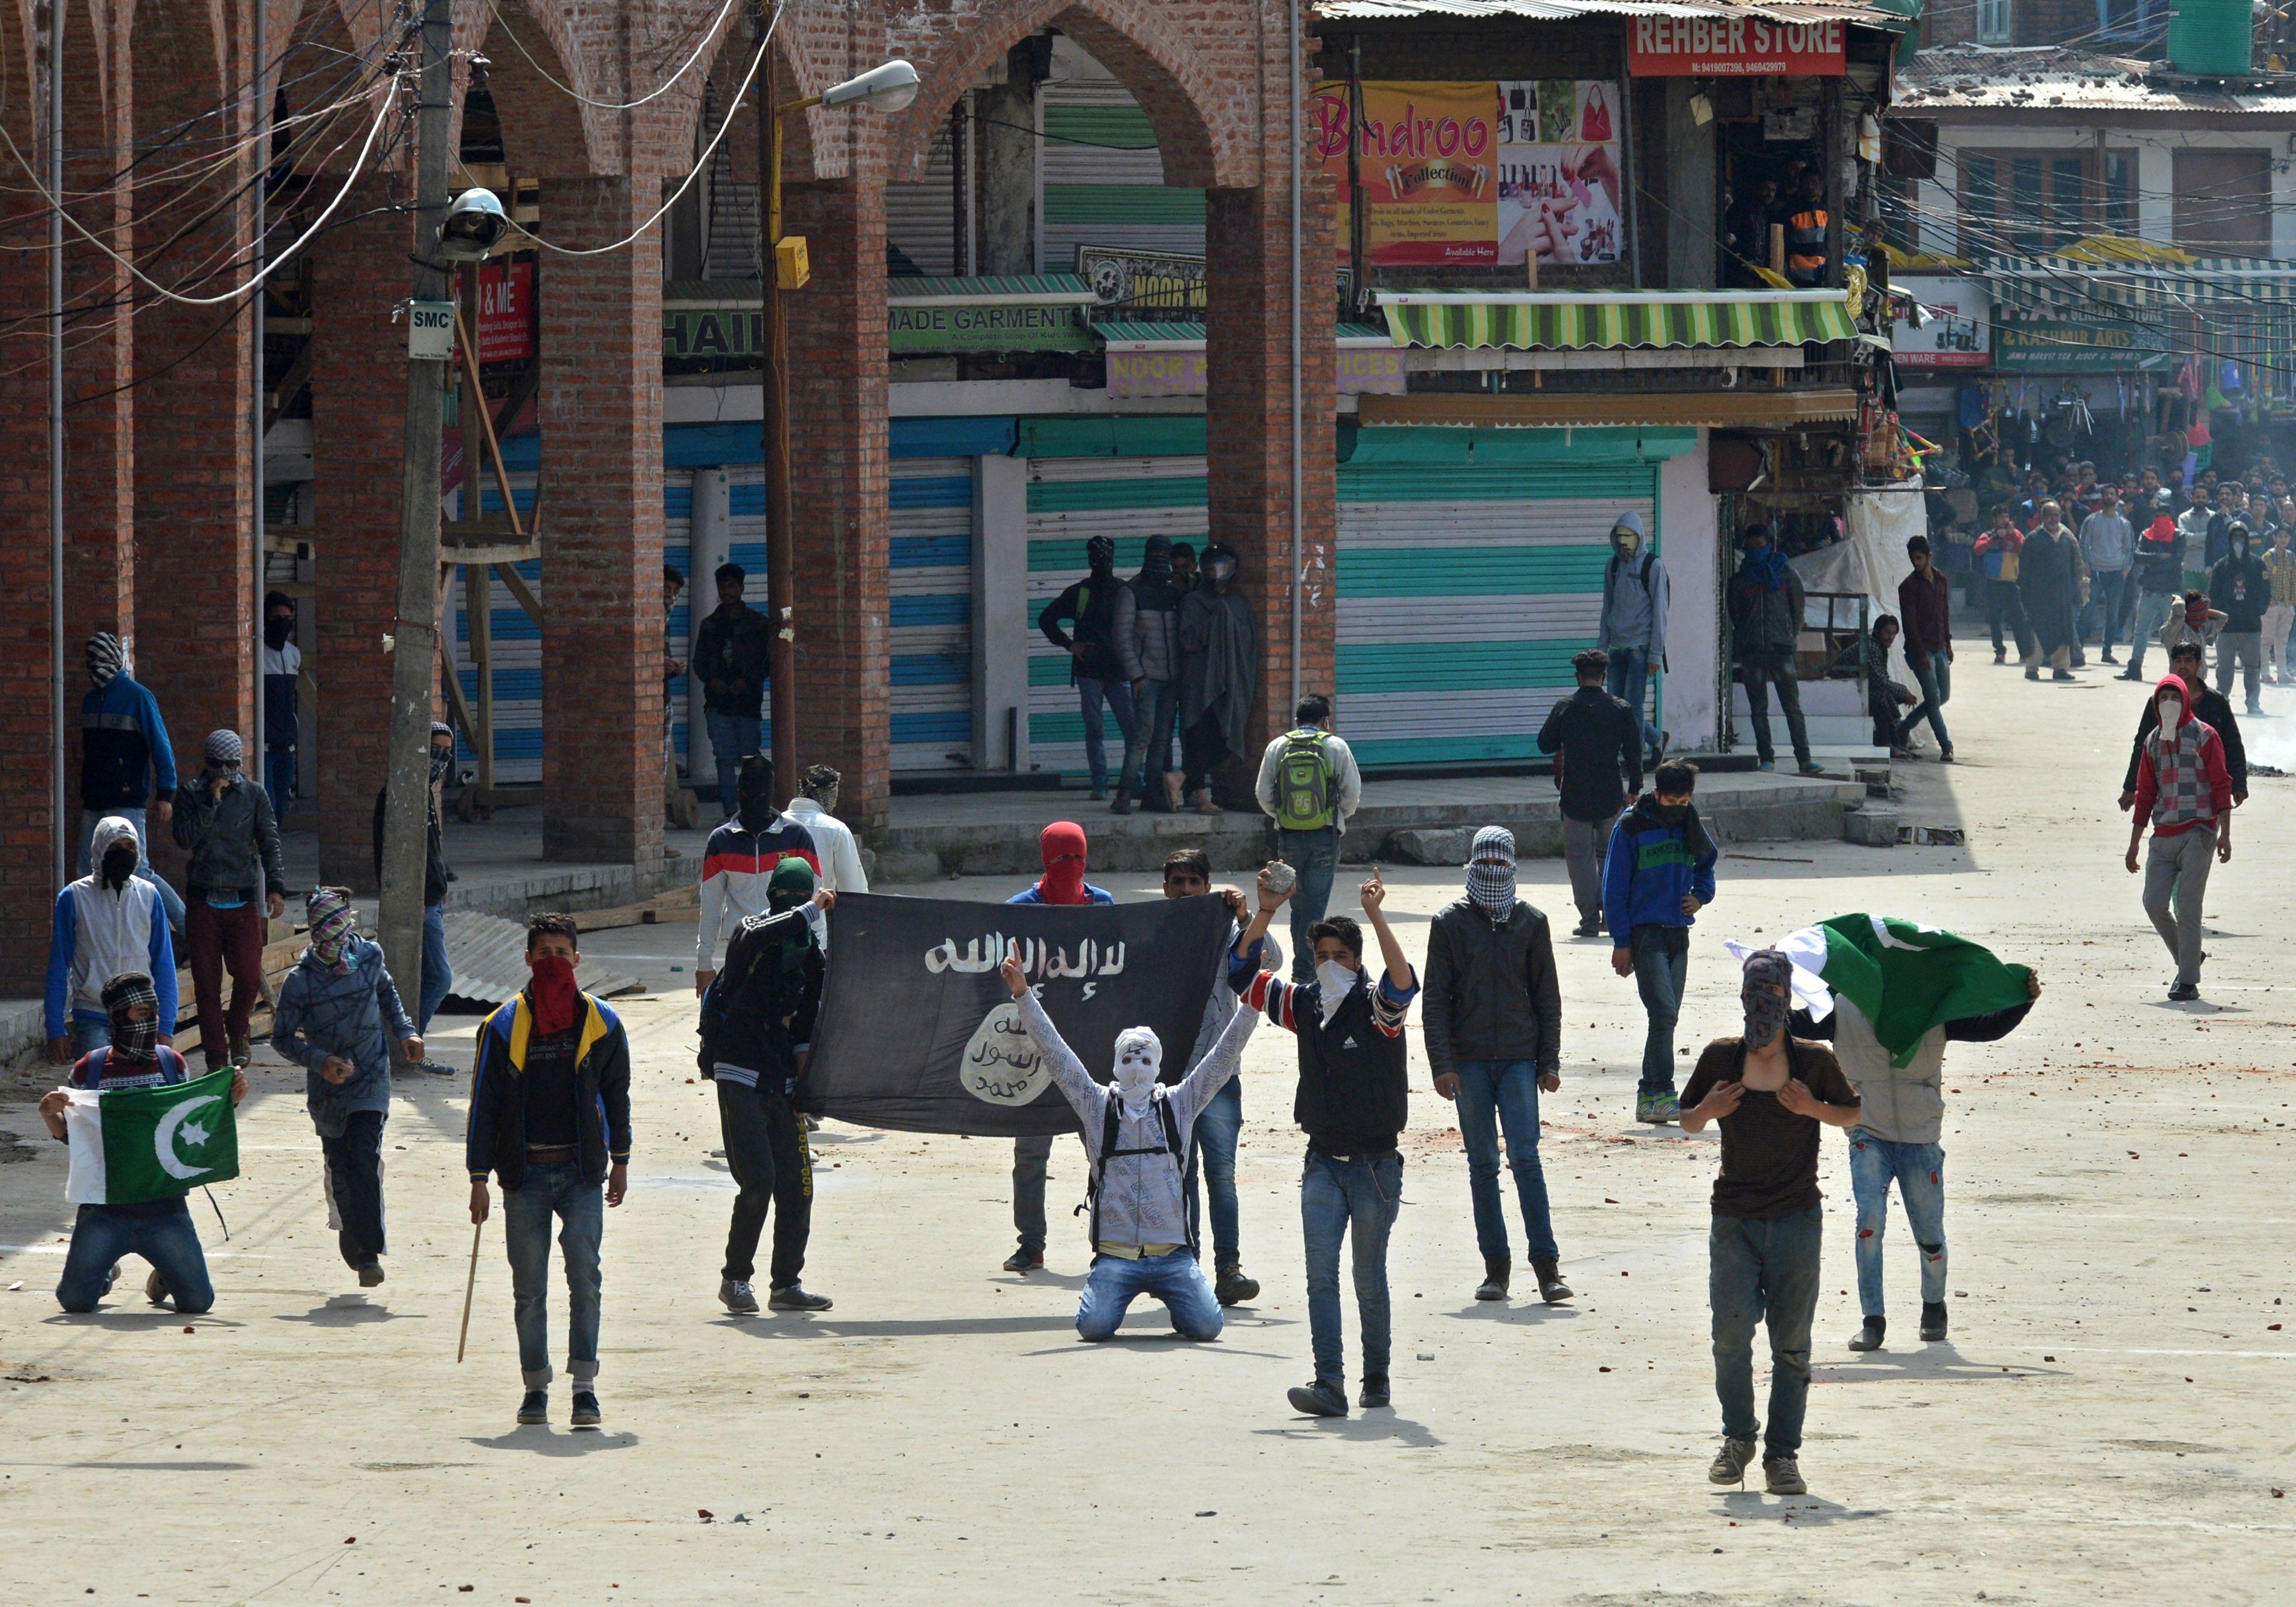 ISIS聲稱在印度建立一個省 專家:荒謬